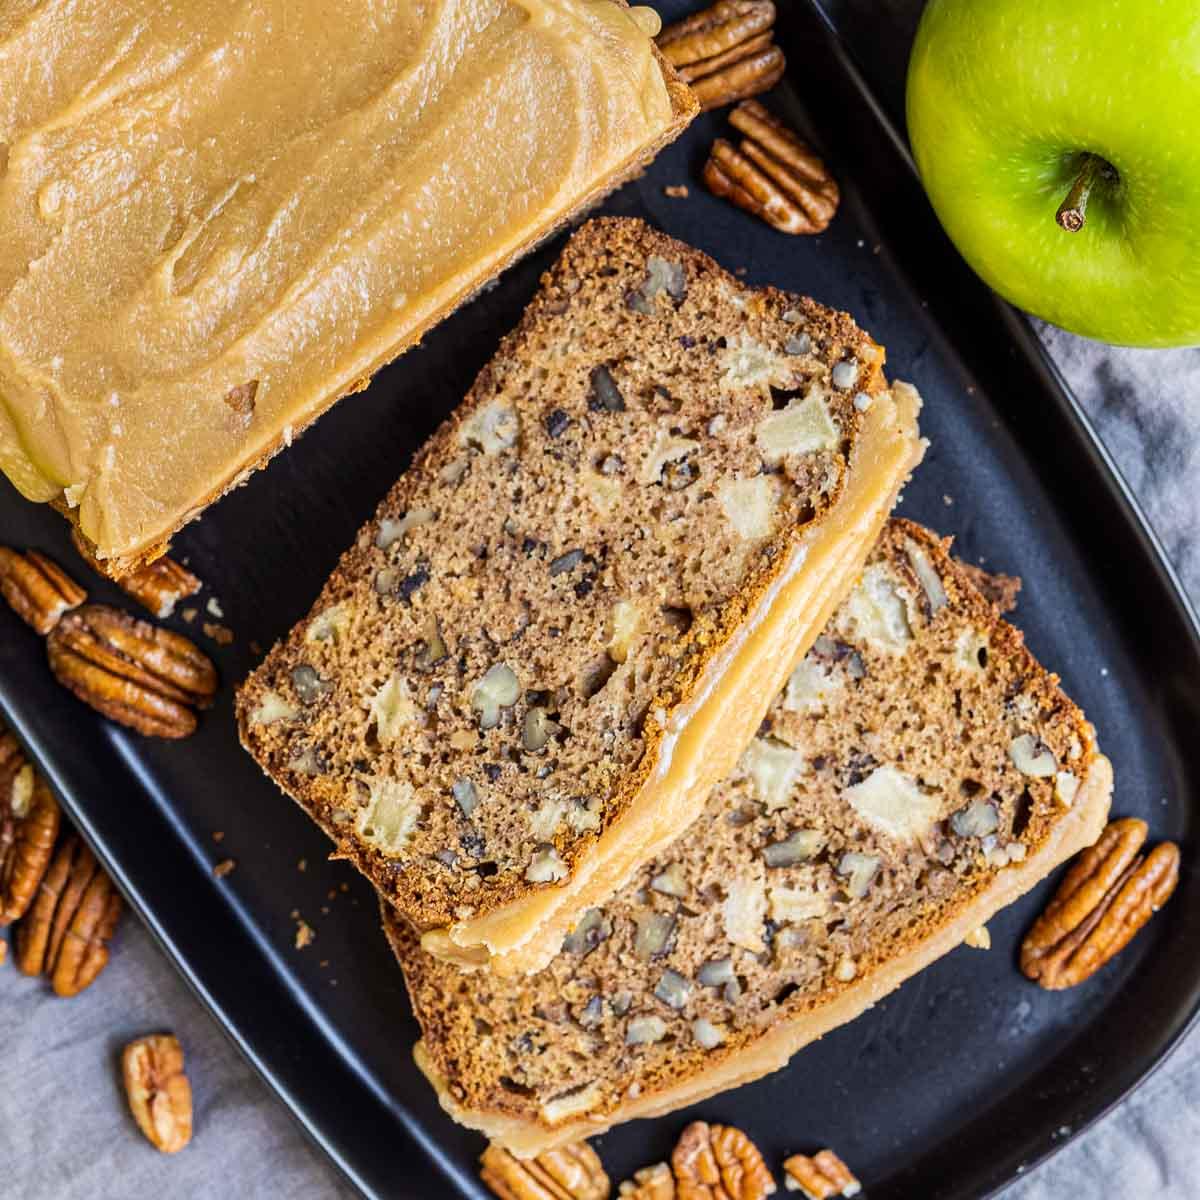 Caramel Apple Bread sliced on plate